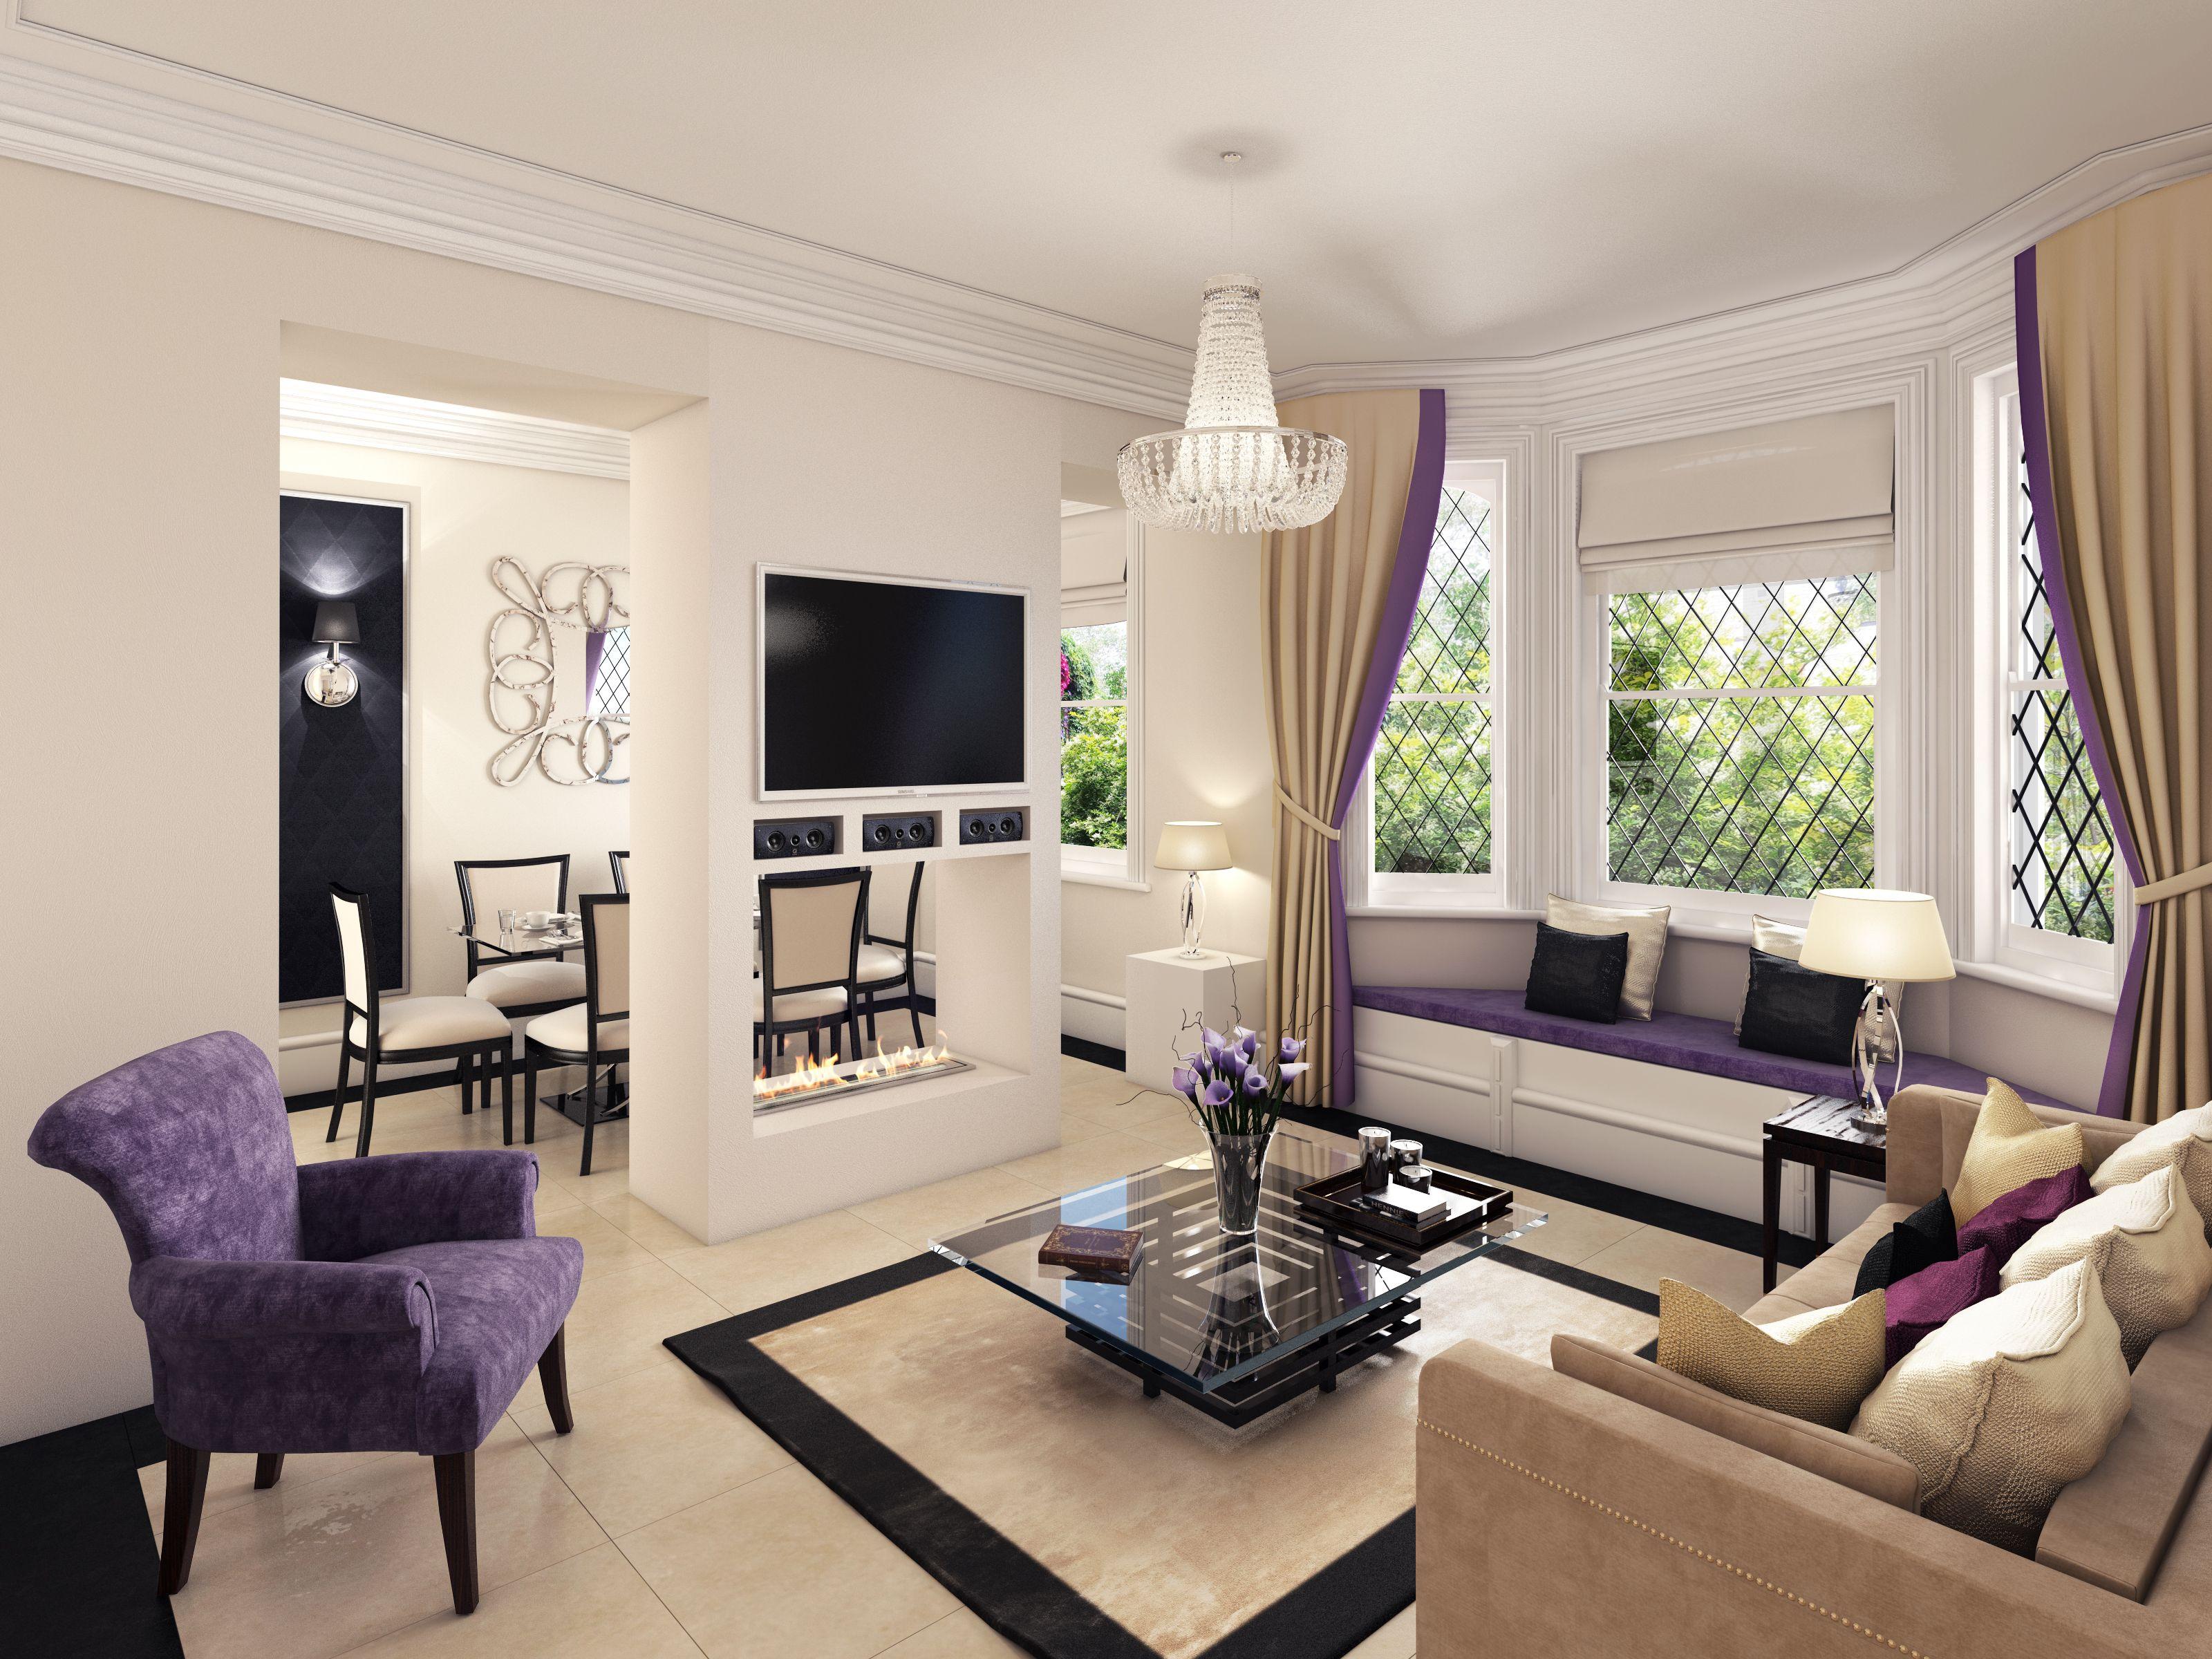 1.61 London - Luxury reception room design | Luxury ...